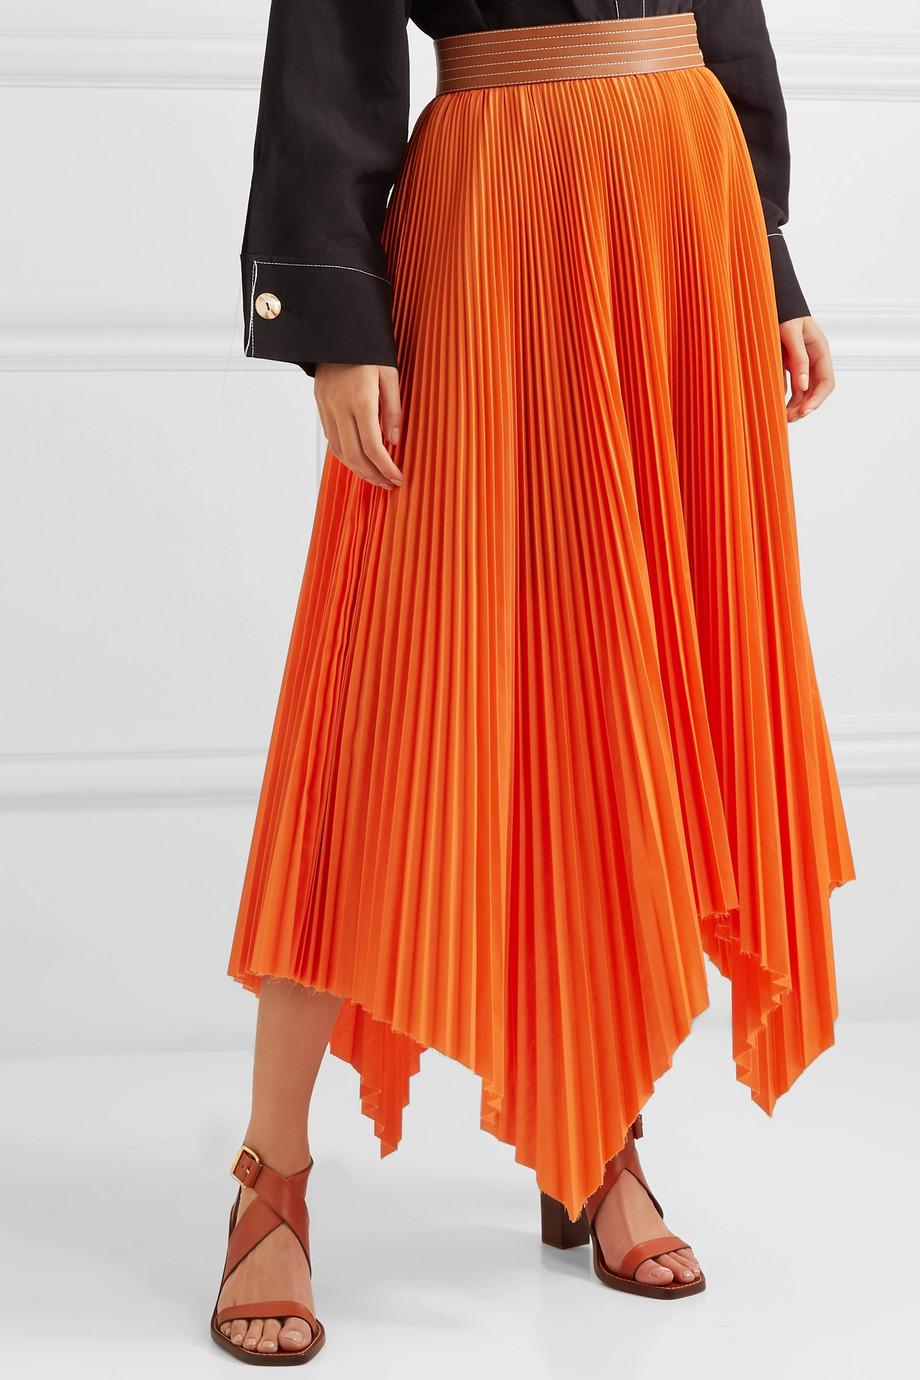 eef46e0fb35 Loewe Asymmetric leather-trimmed pleated poplin midi skirt